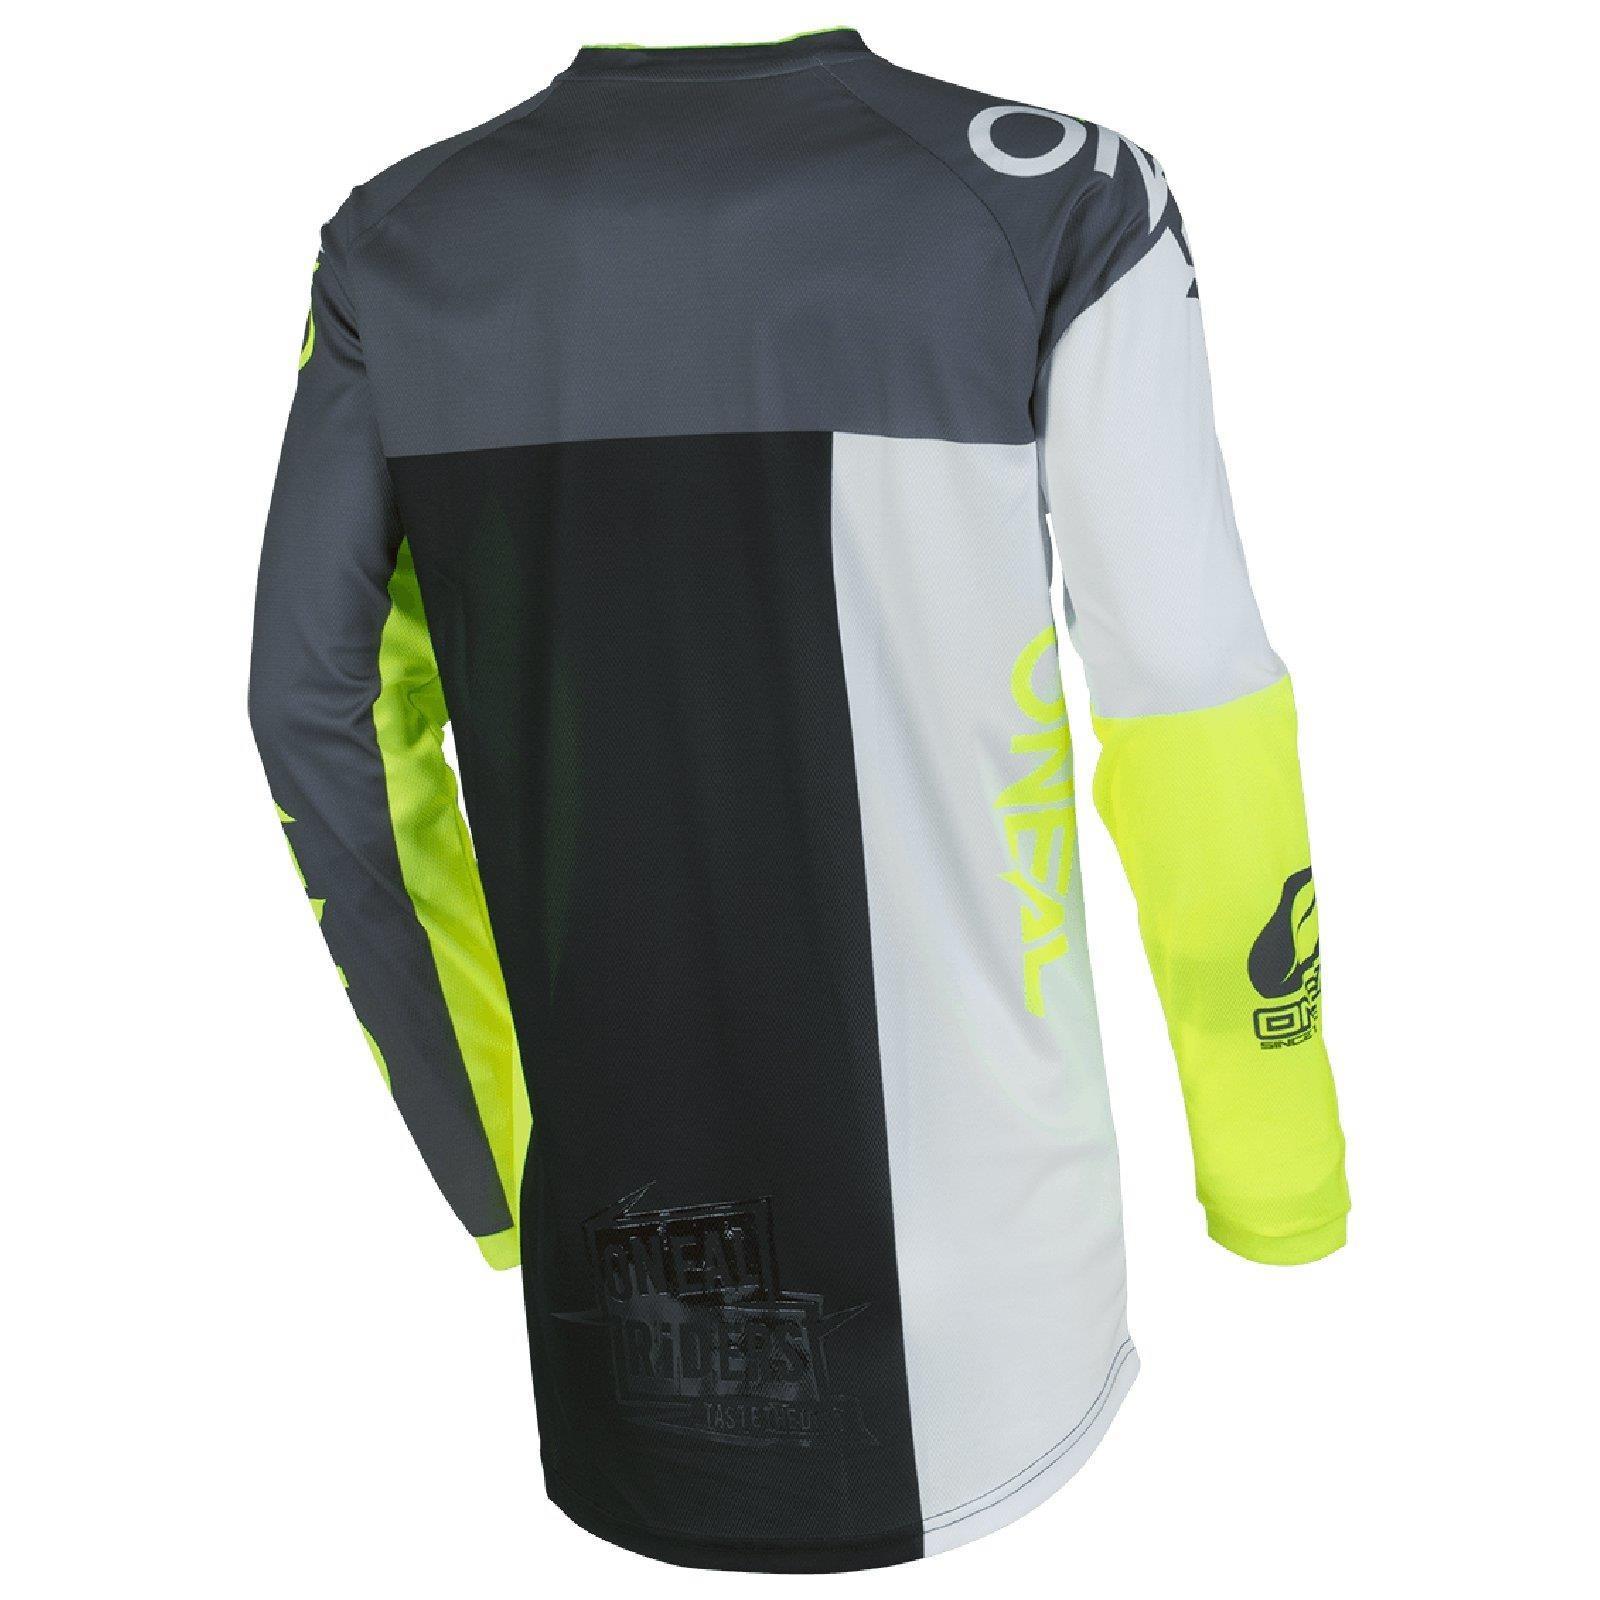 O-039-Neal-elemento-Mayhem-JERSEY-Racewear-Motocross-Maglia-MX-DH-FR-MTB-MOUNTAIN-BIKE miniatura 98